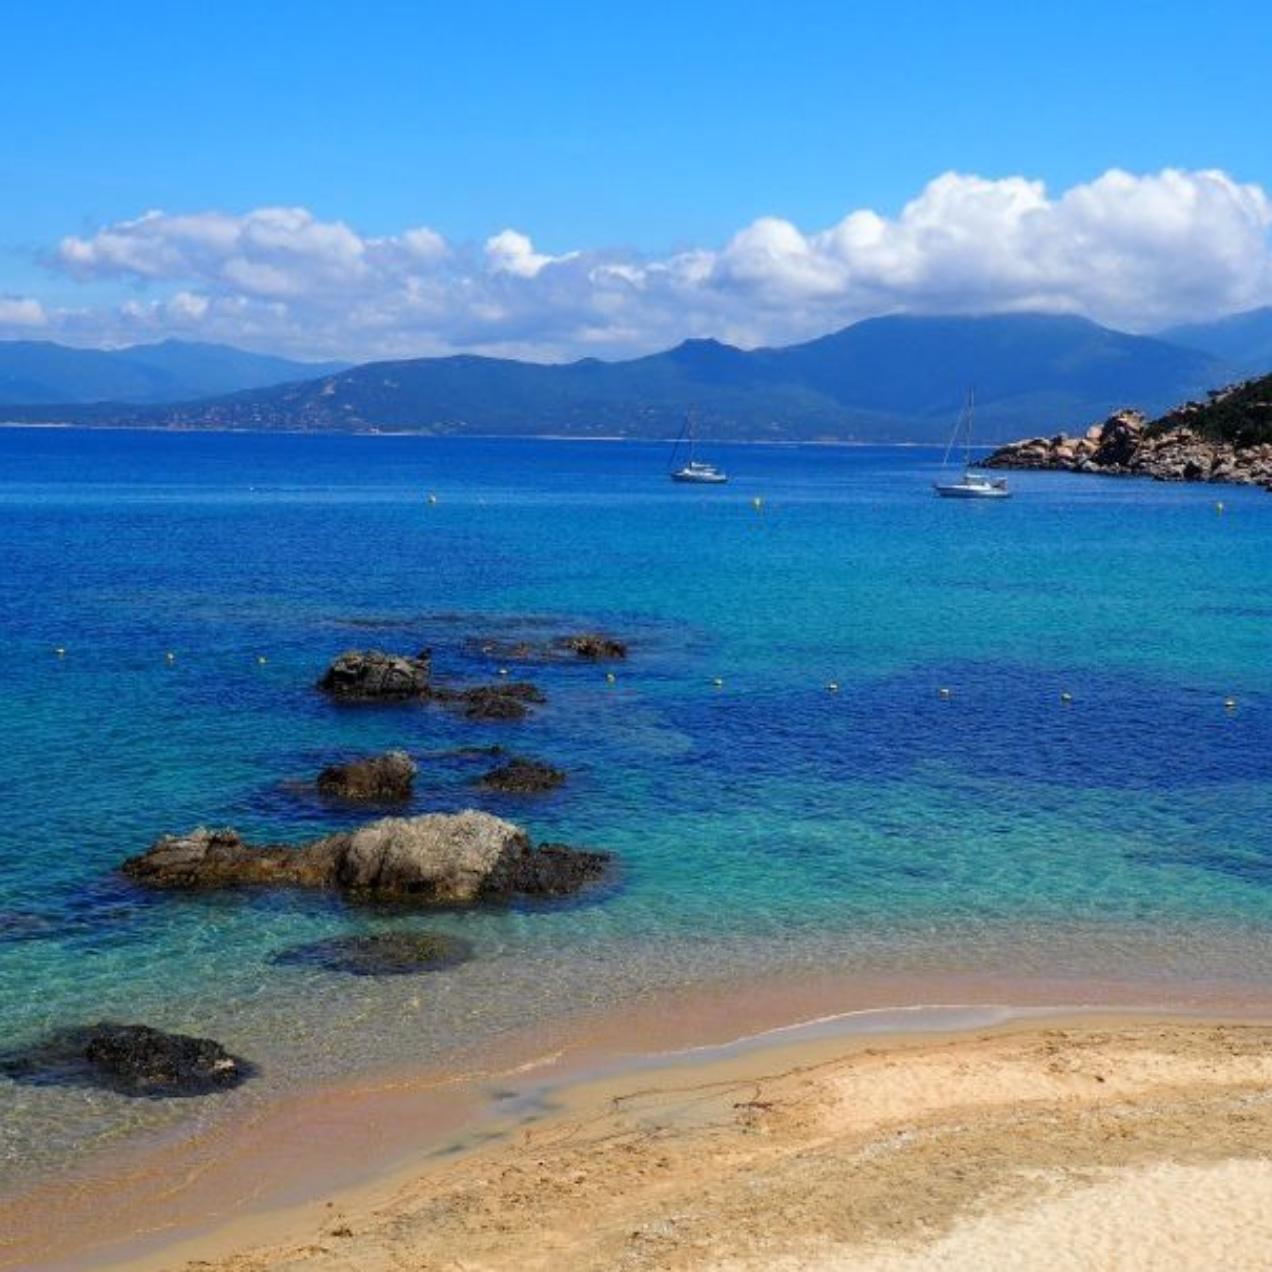 Carnet voyage 2 semaines en Corse